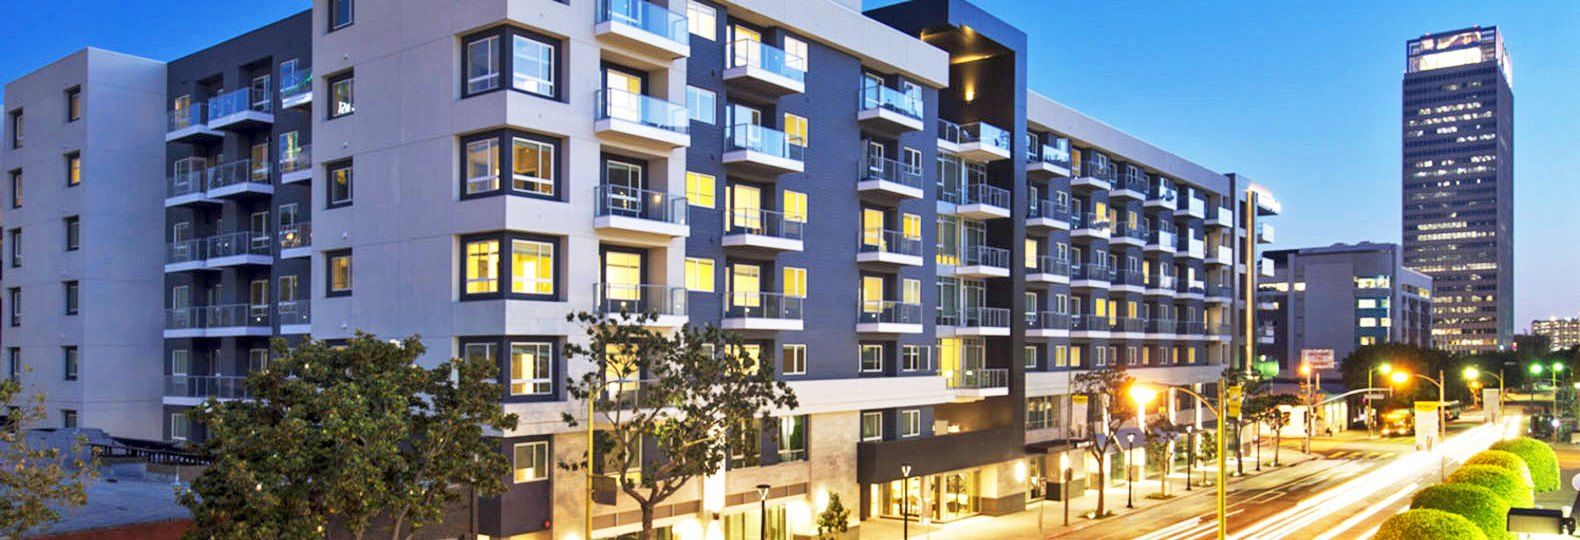 Apartments: